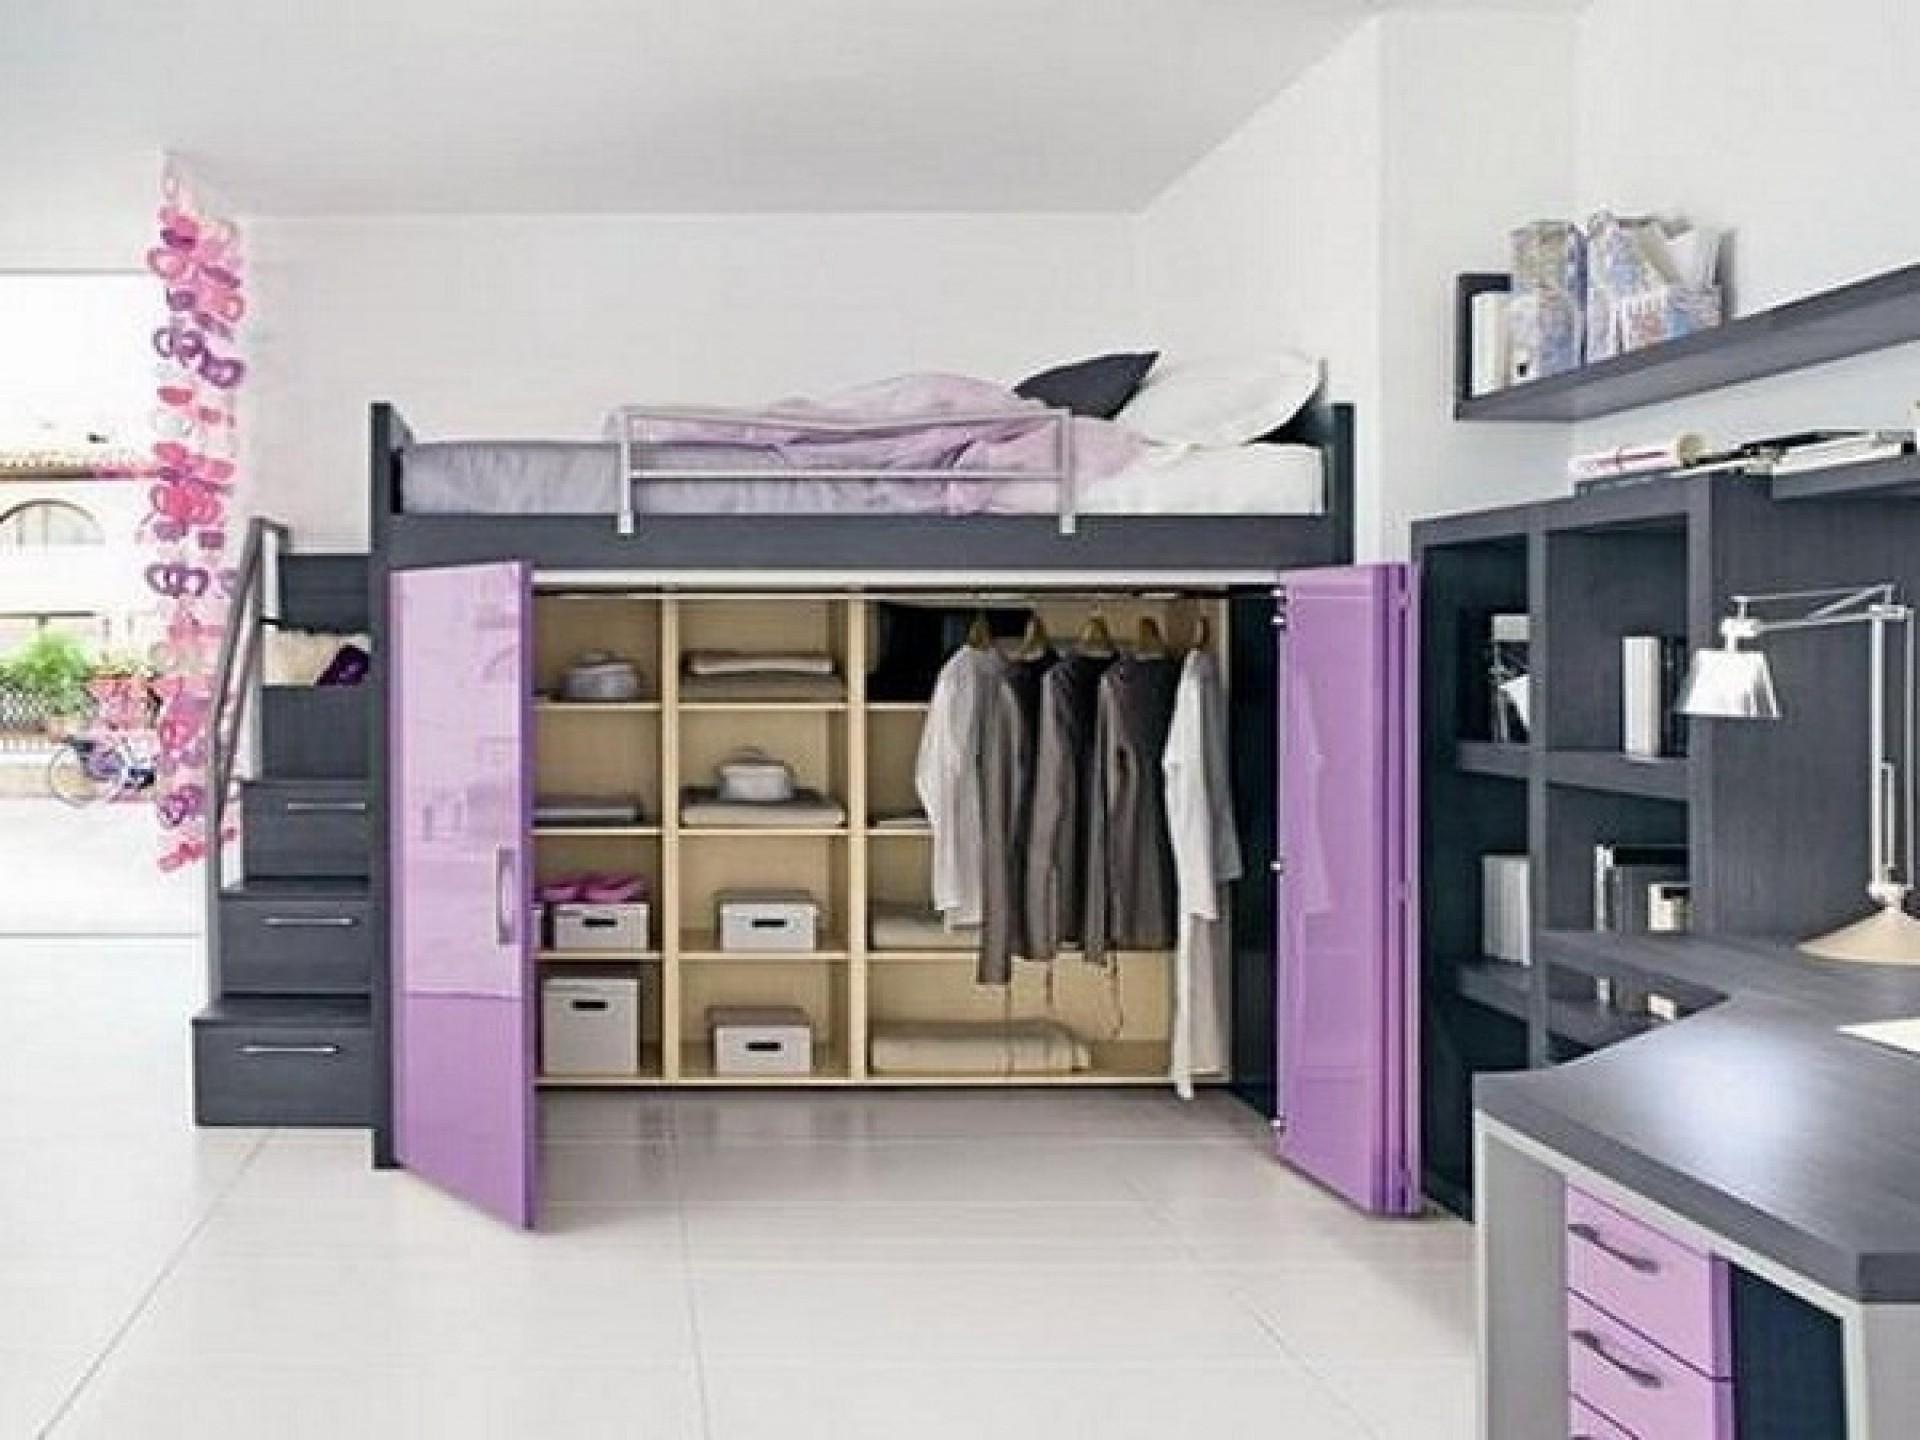 Loft beds with storage underneath & Loft Beds With Storage Underneath - Foter